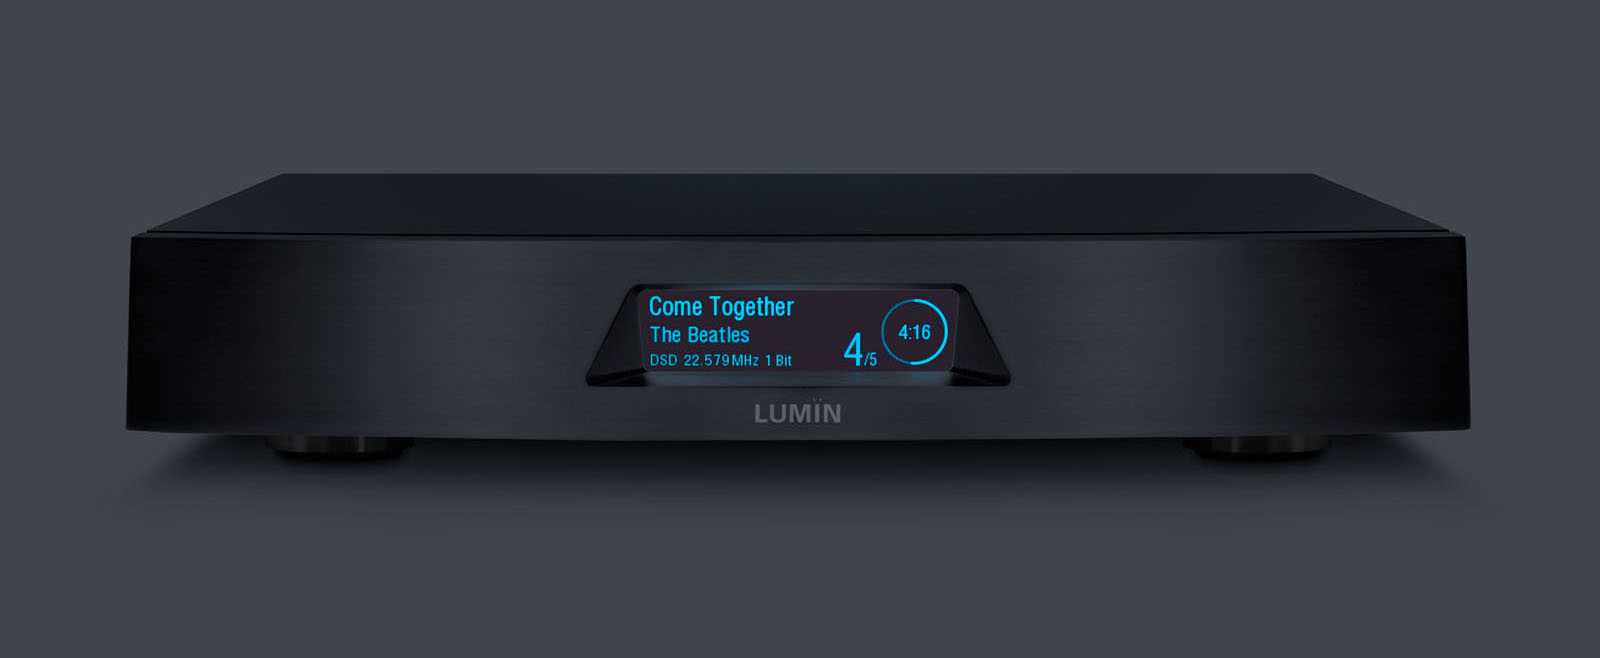 Lumin T2 Zwart Hans Audio Nieuw binnen: Lumin T2